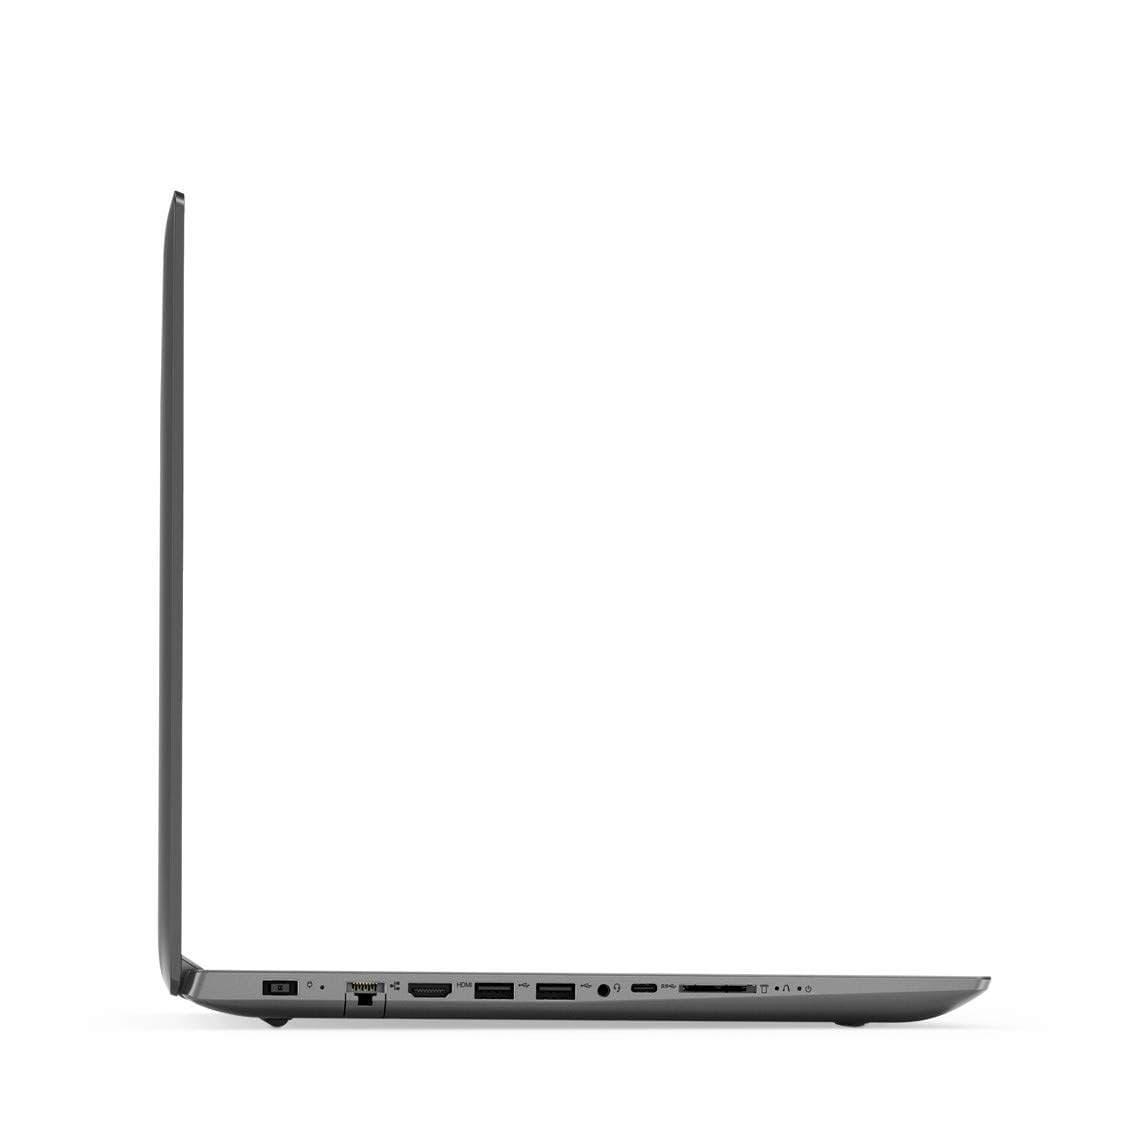 Lenovo Ideapad 330 81DE01Q6IN 15.6- Laptop (I5-8250U/8GB/1TB/DOS/Integrated Graphics) Onyx Black